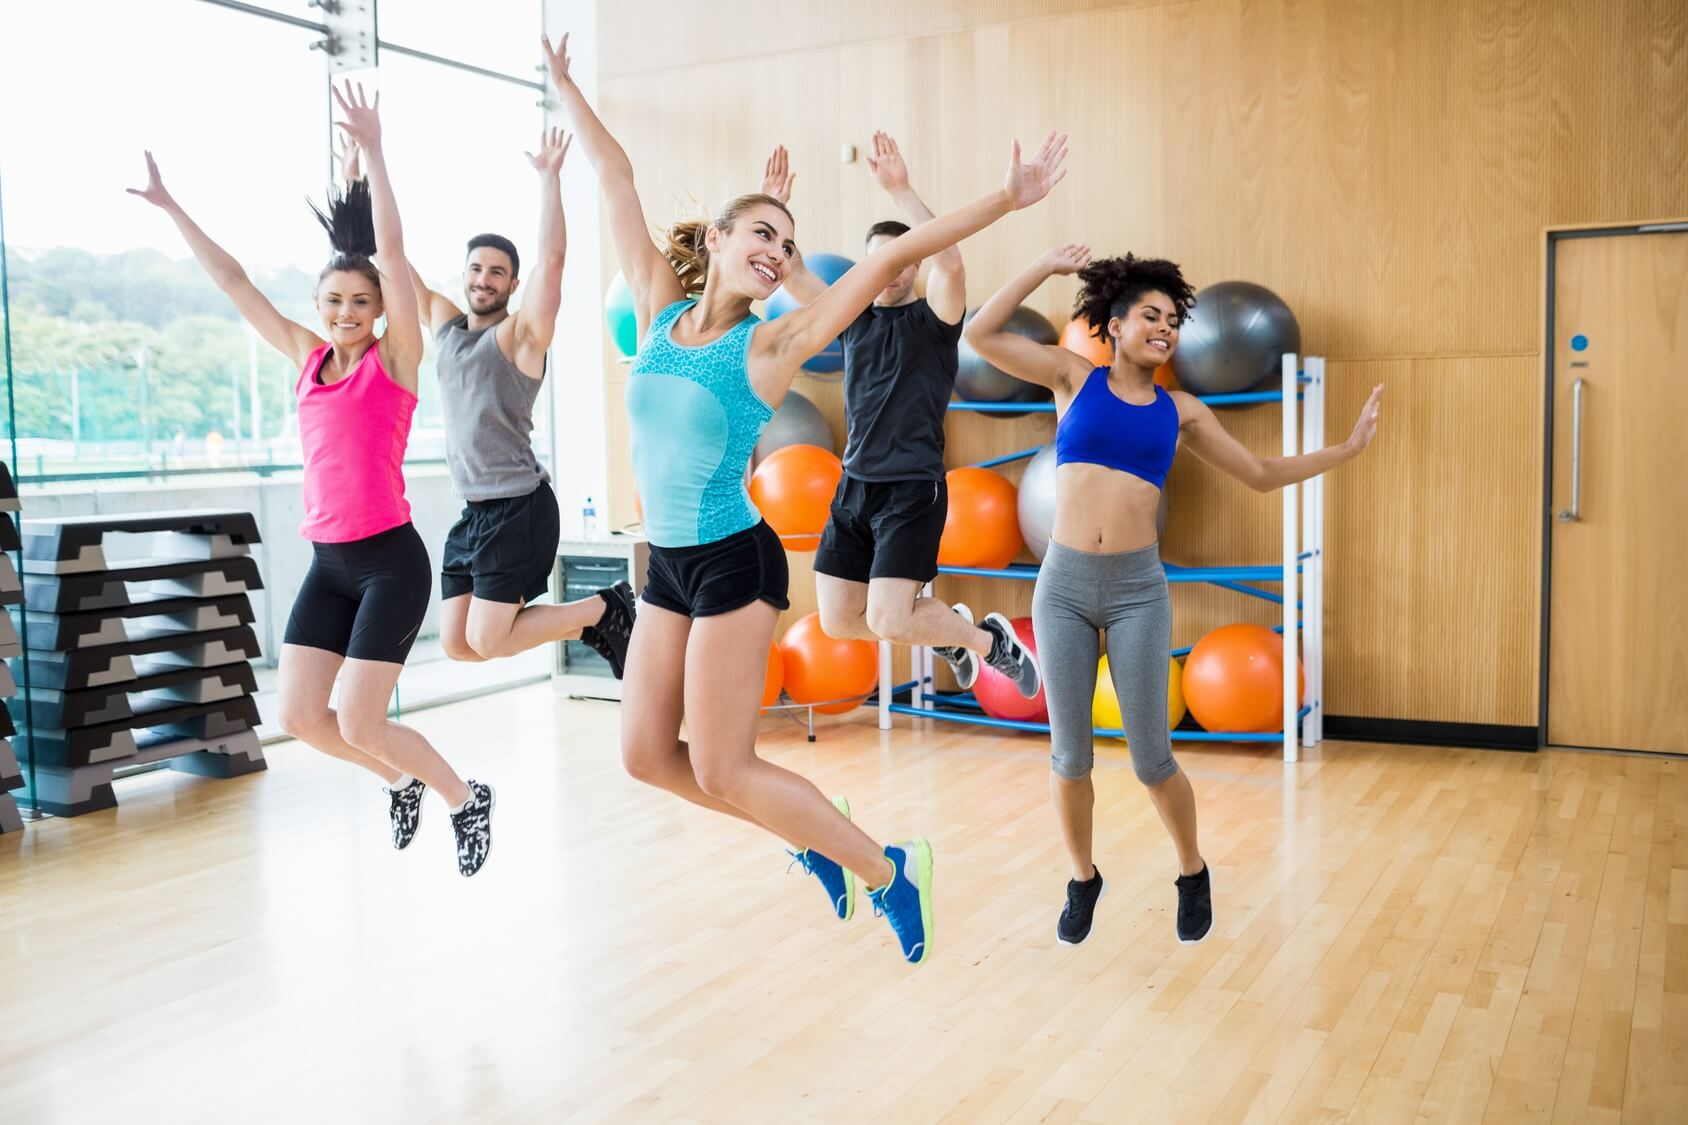 Freunde finden Berlin Sportverein Fitness